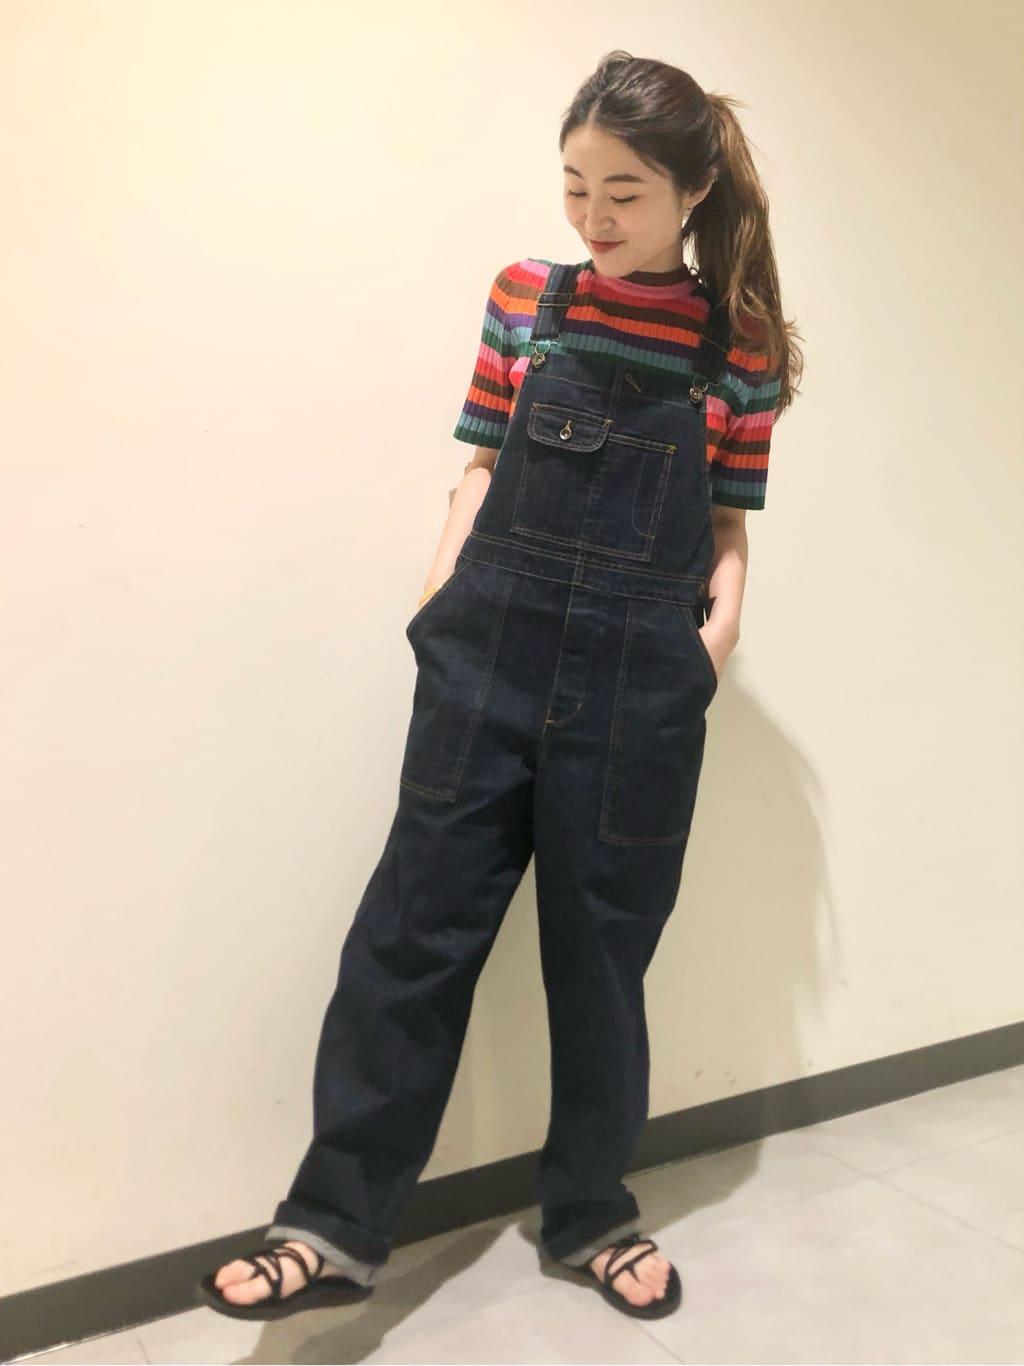 - CHILD WOMAN CHILD WOMAN , PAR ICI ルミネ池袋 身長:153cm 2021.07.16